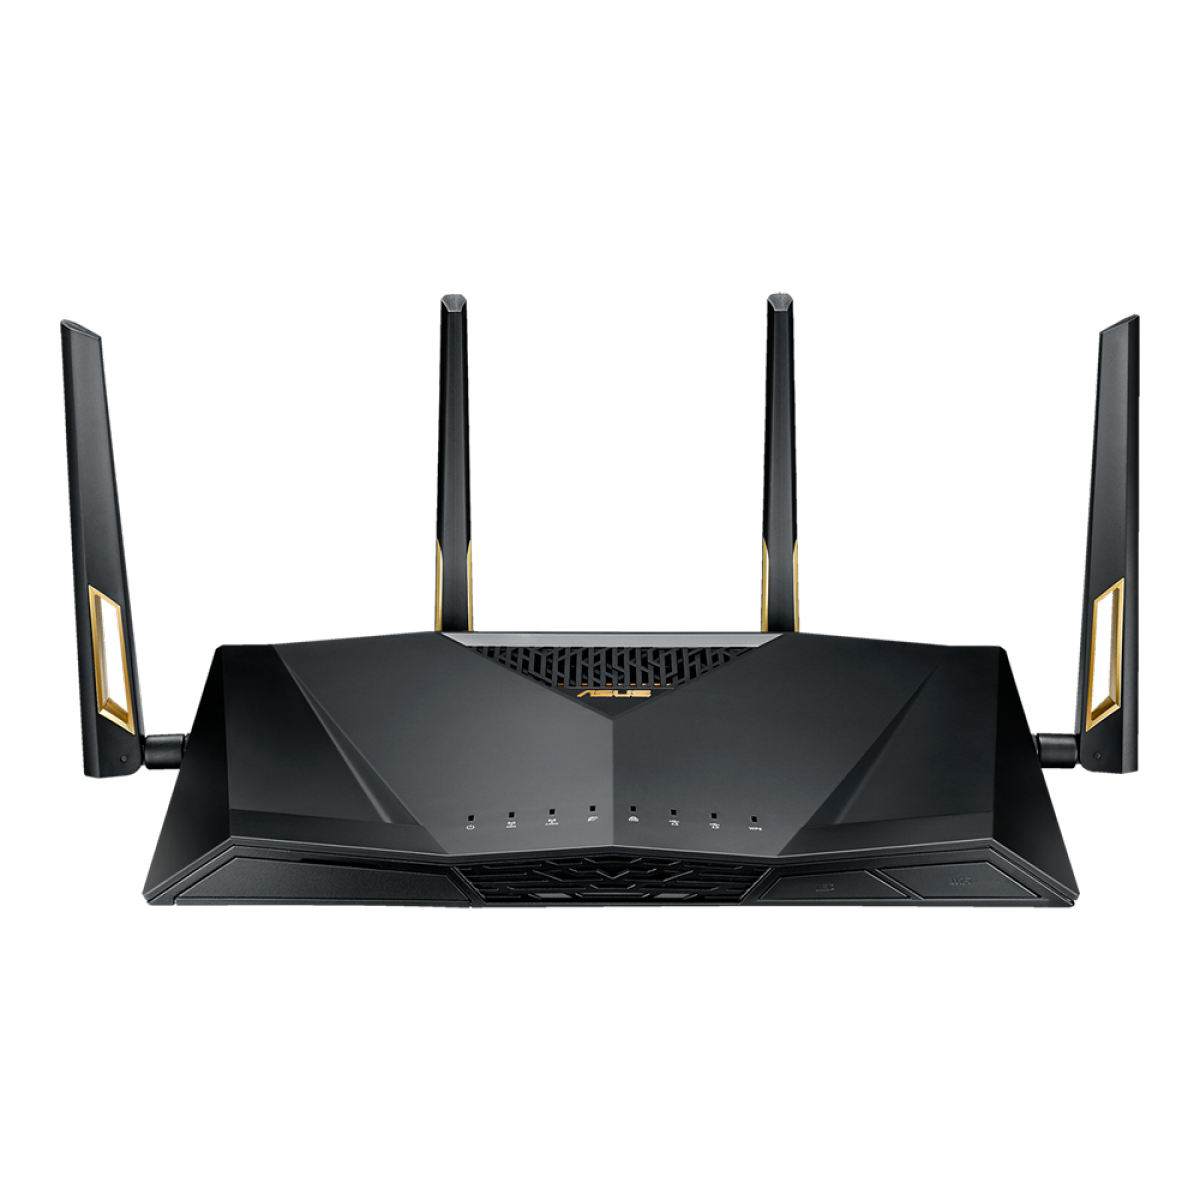 Roteador Asus RT-AX88U, WiFi 6, AX6000, MU-MIMO, 90IG04F0-MM3G00